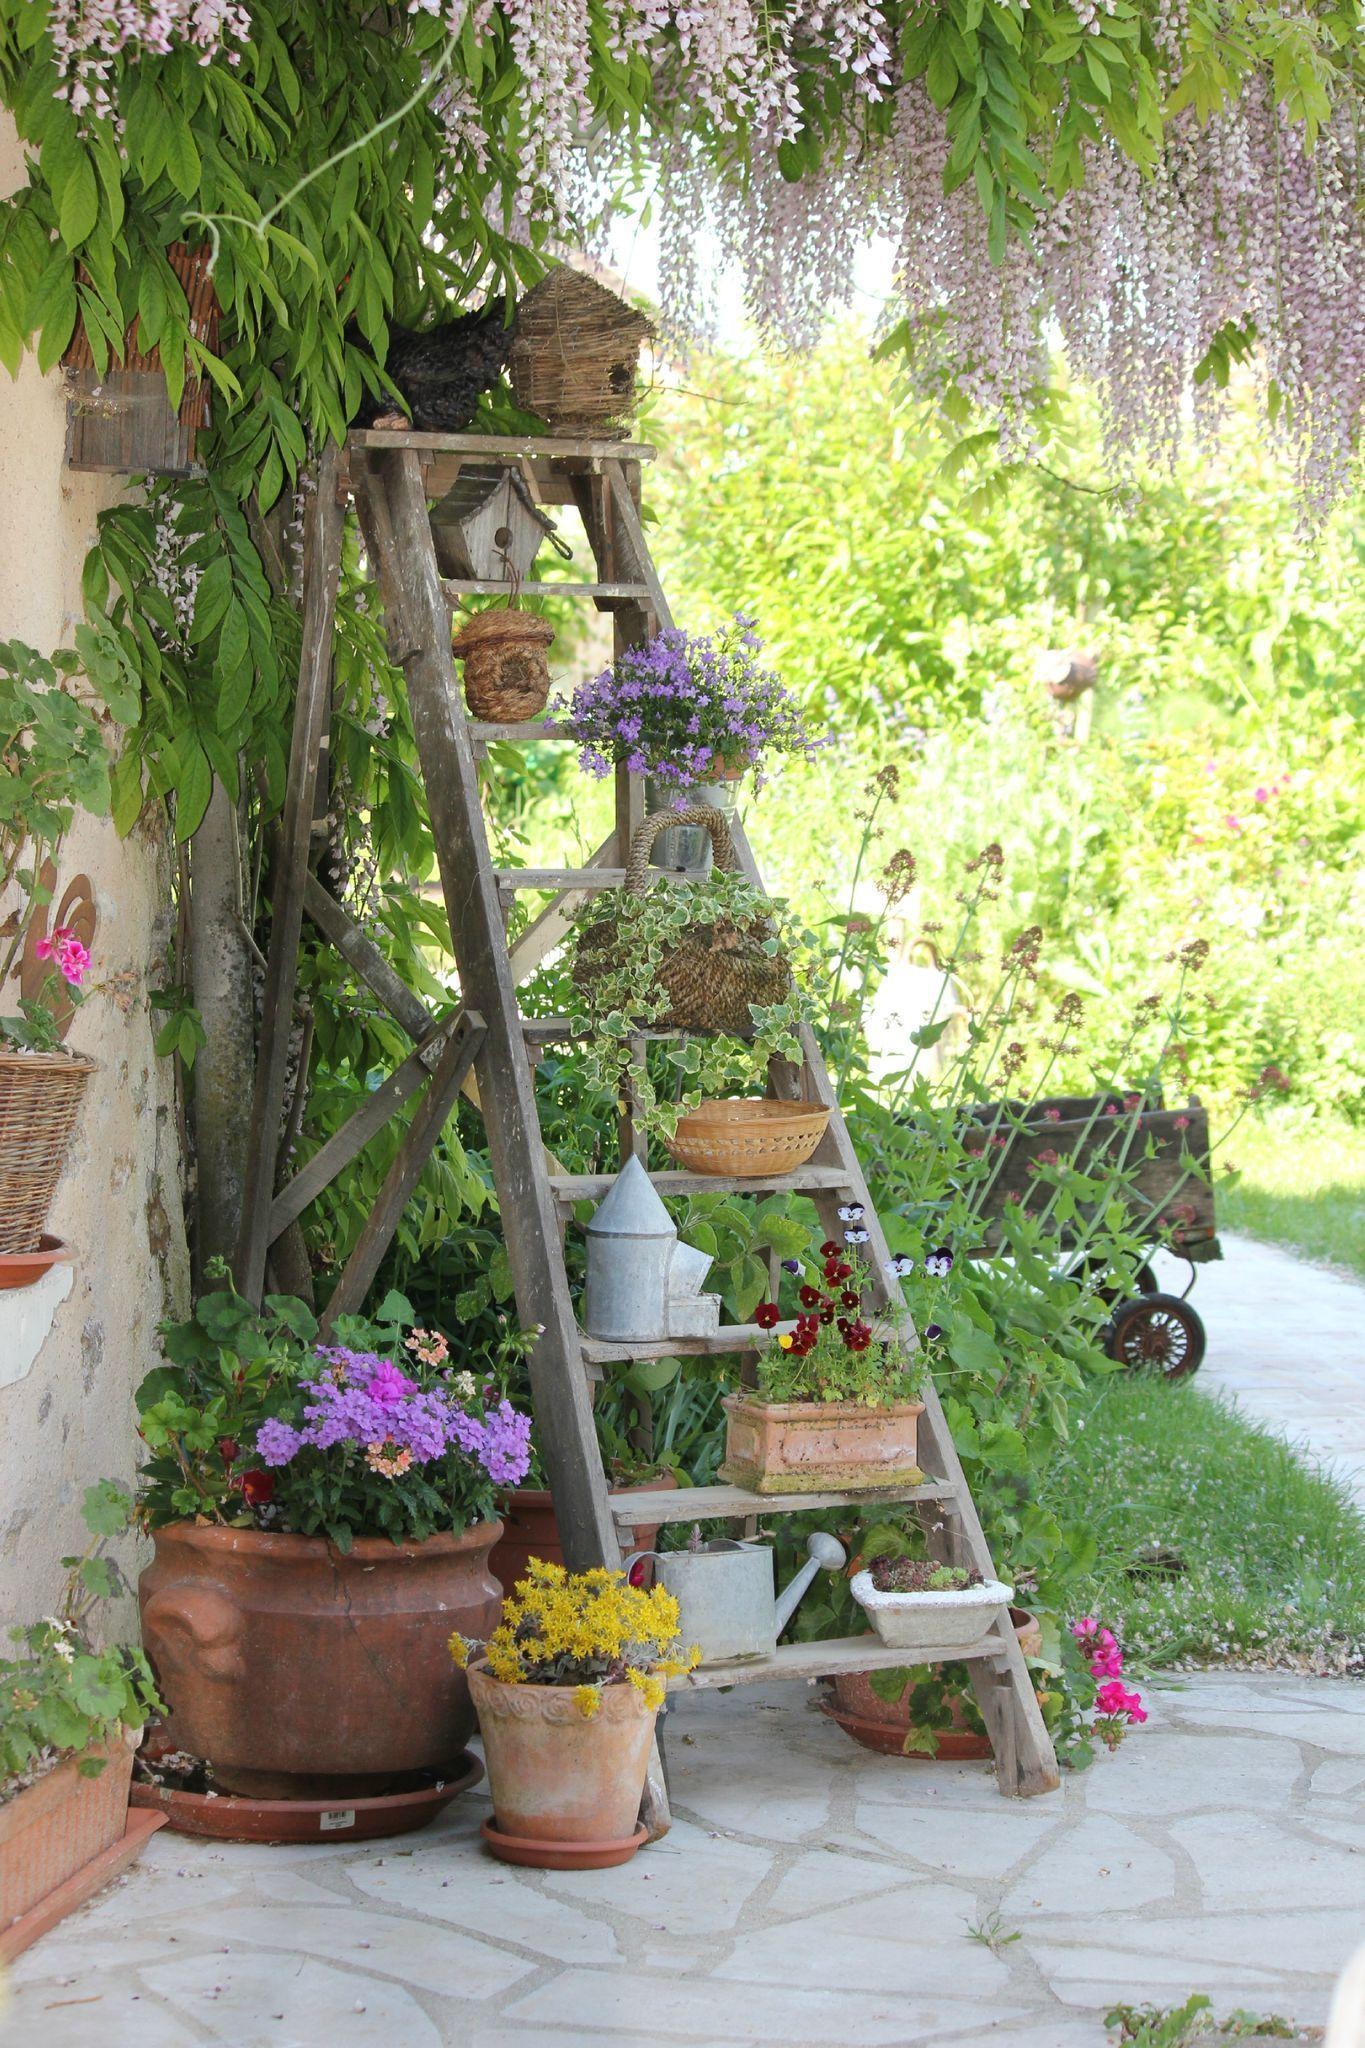 Home Furnishings & Décor, Indoor & Outdoor BrylaneHome